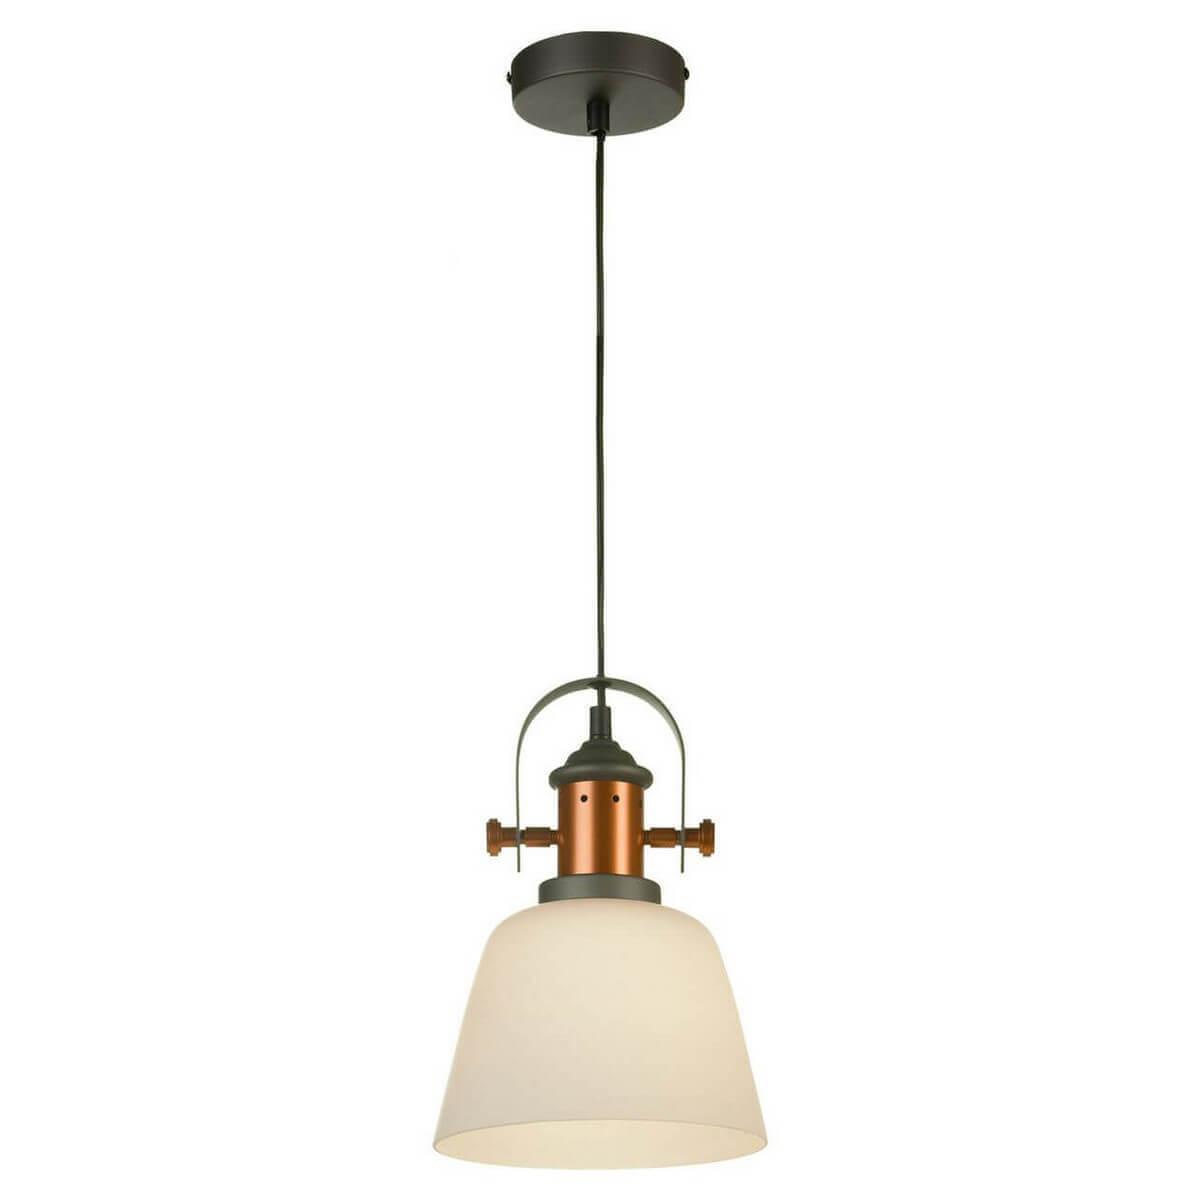 цена на Светильник Lussole LOFT LSP-9846 LSP-9845